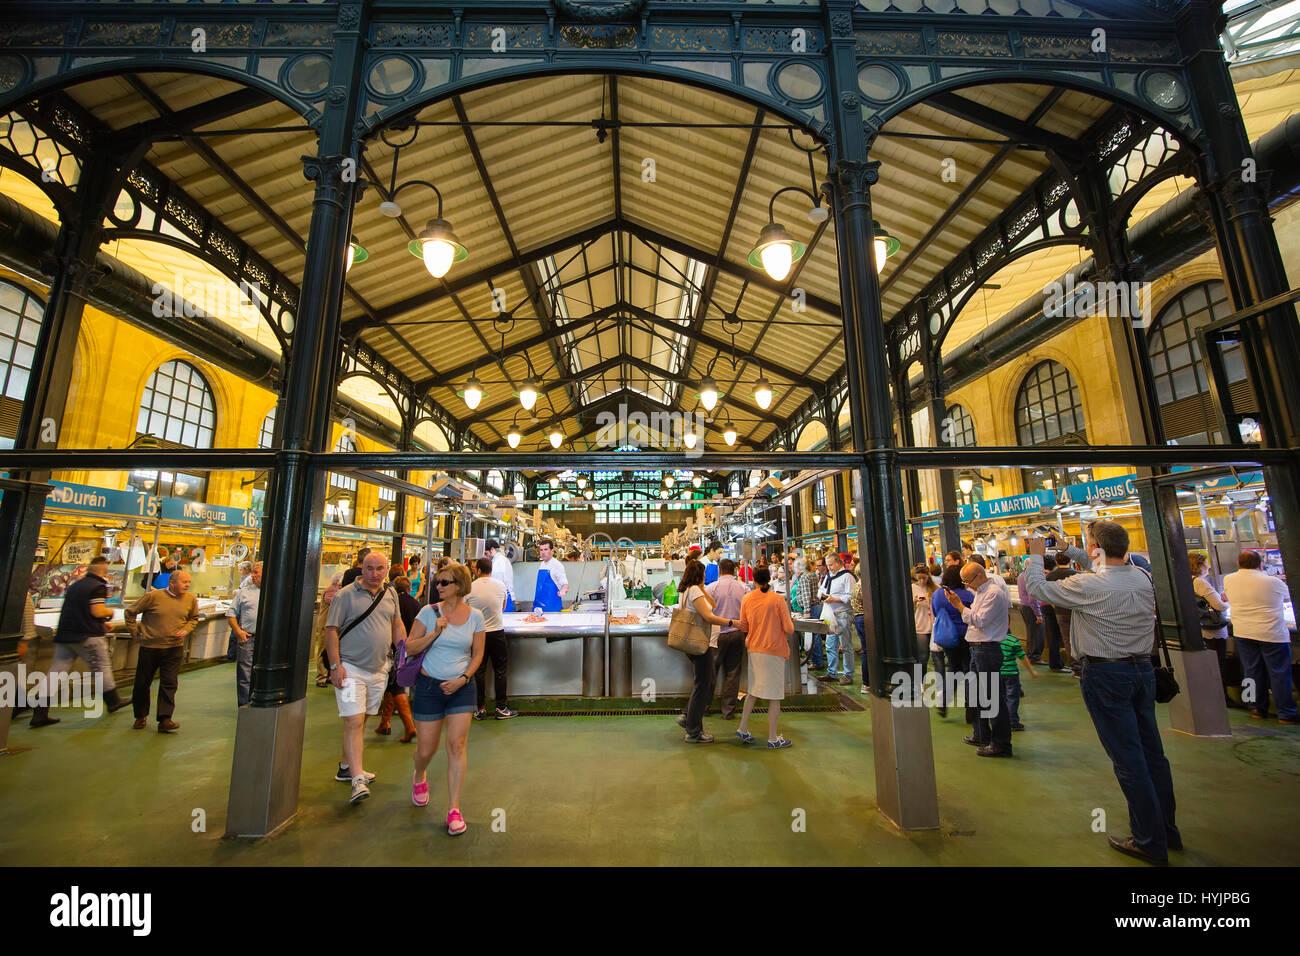 Markt. Mercado Central de Abastos, Jerez De La Frontera, Cadiz Provinz. Andalusien Südspanien, Europa Stockbild